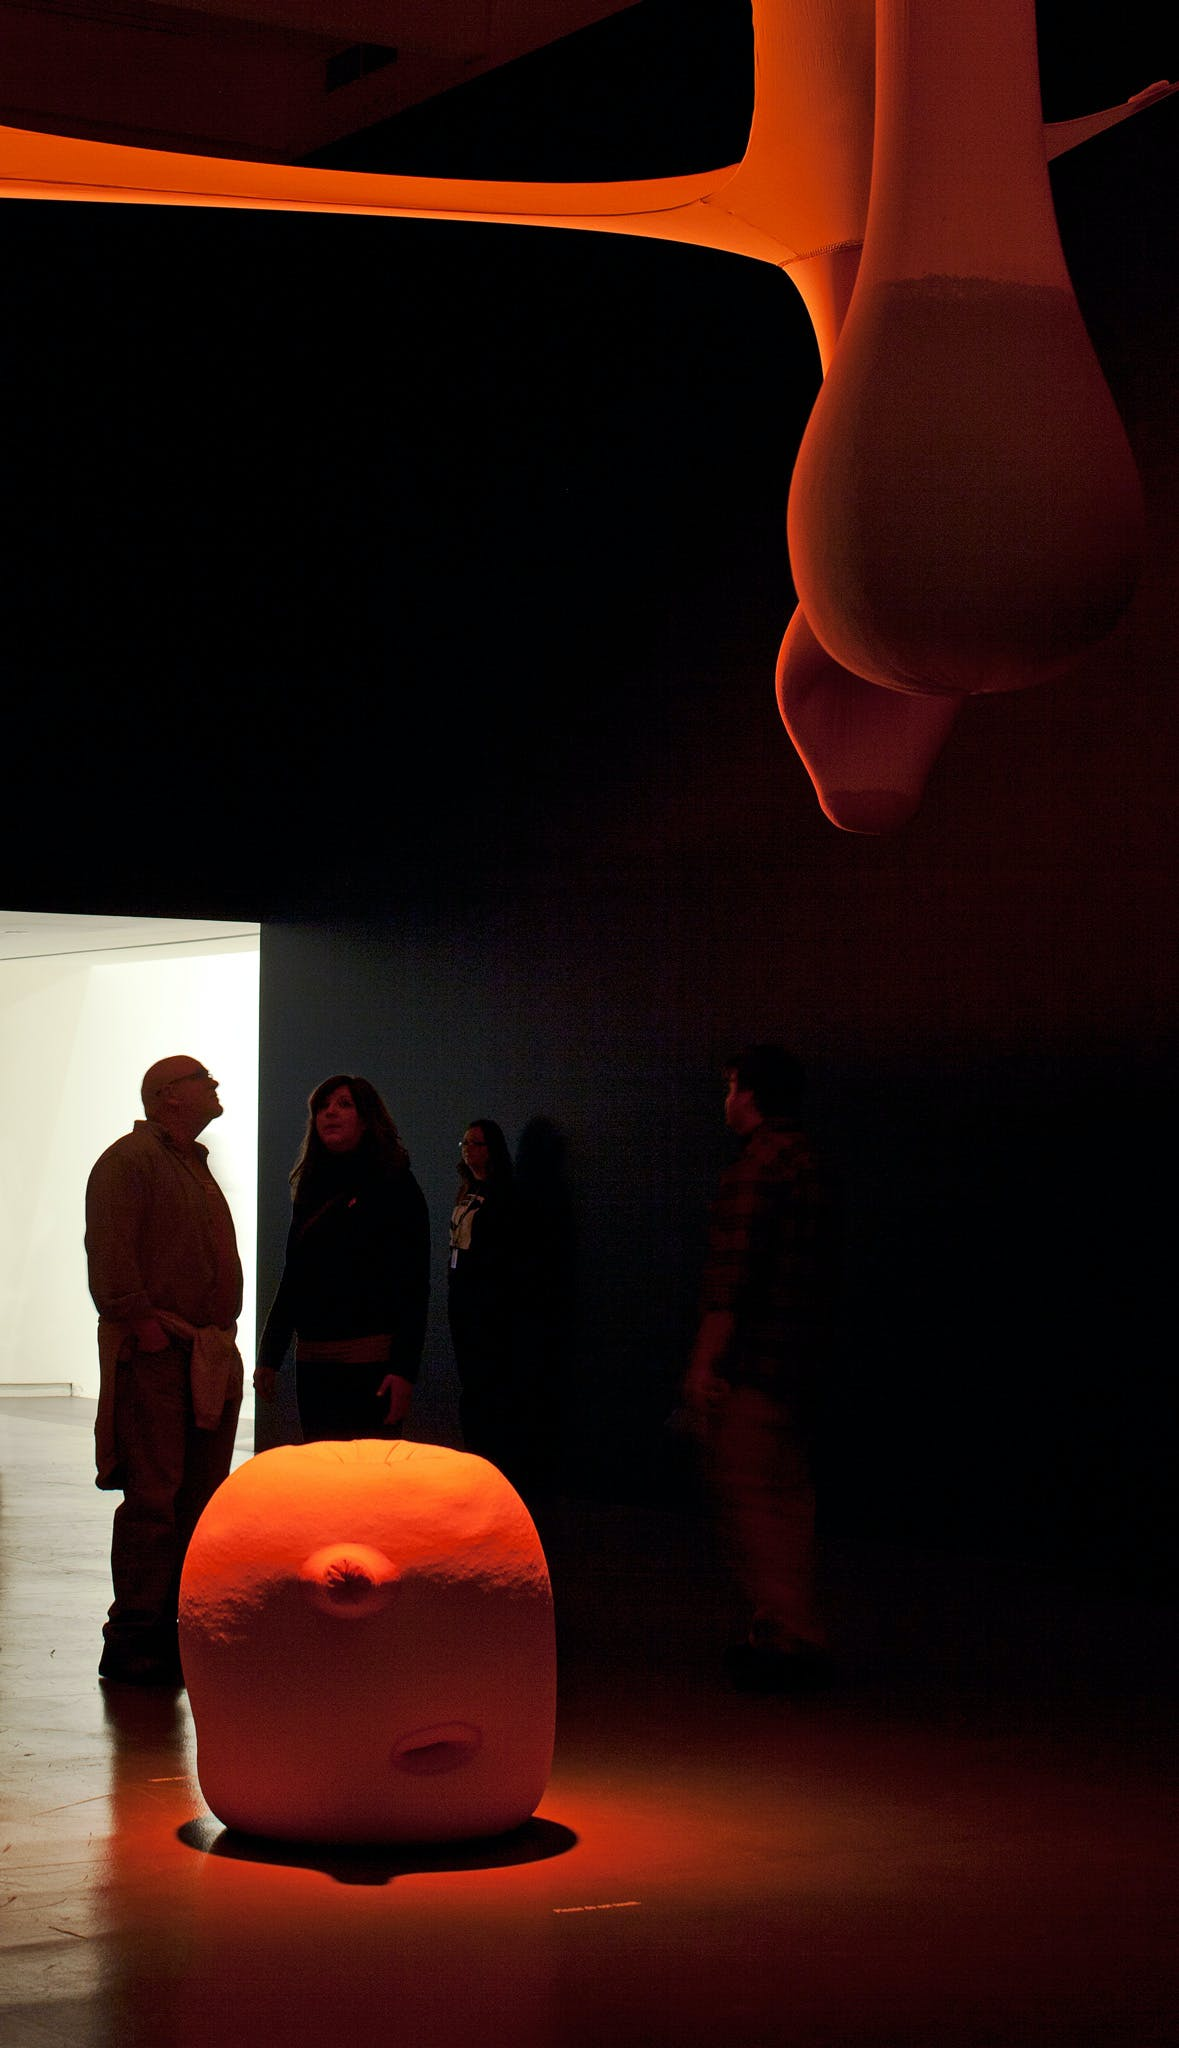 Installation view of the exhibition Dance Works II: Merce Cunningham/Ernesto Neto, 2011